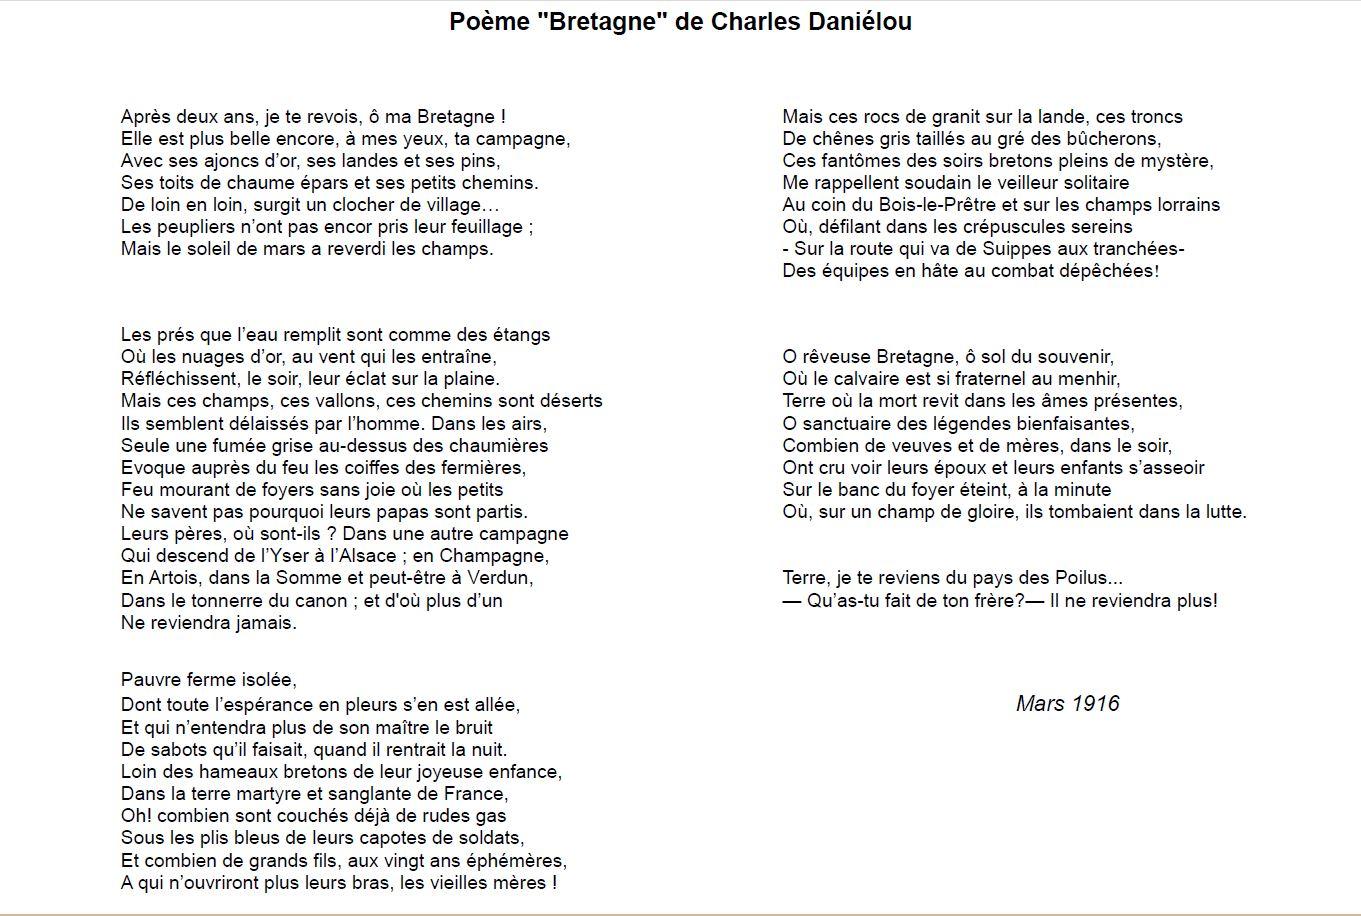 poesie 2 guerre mondiale